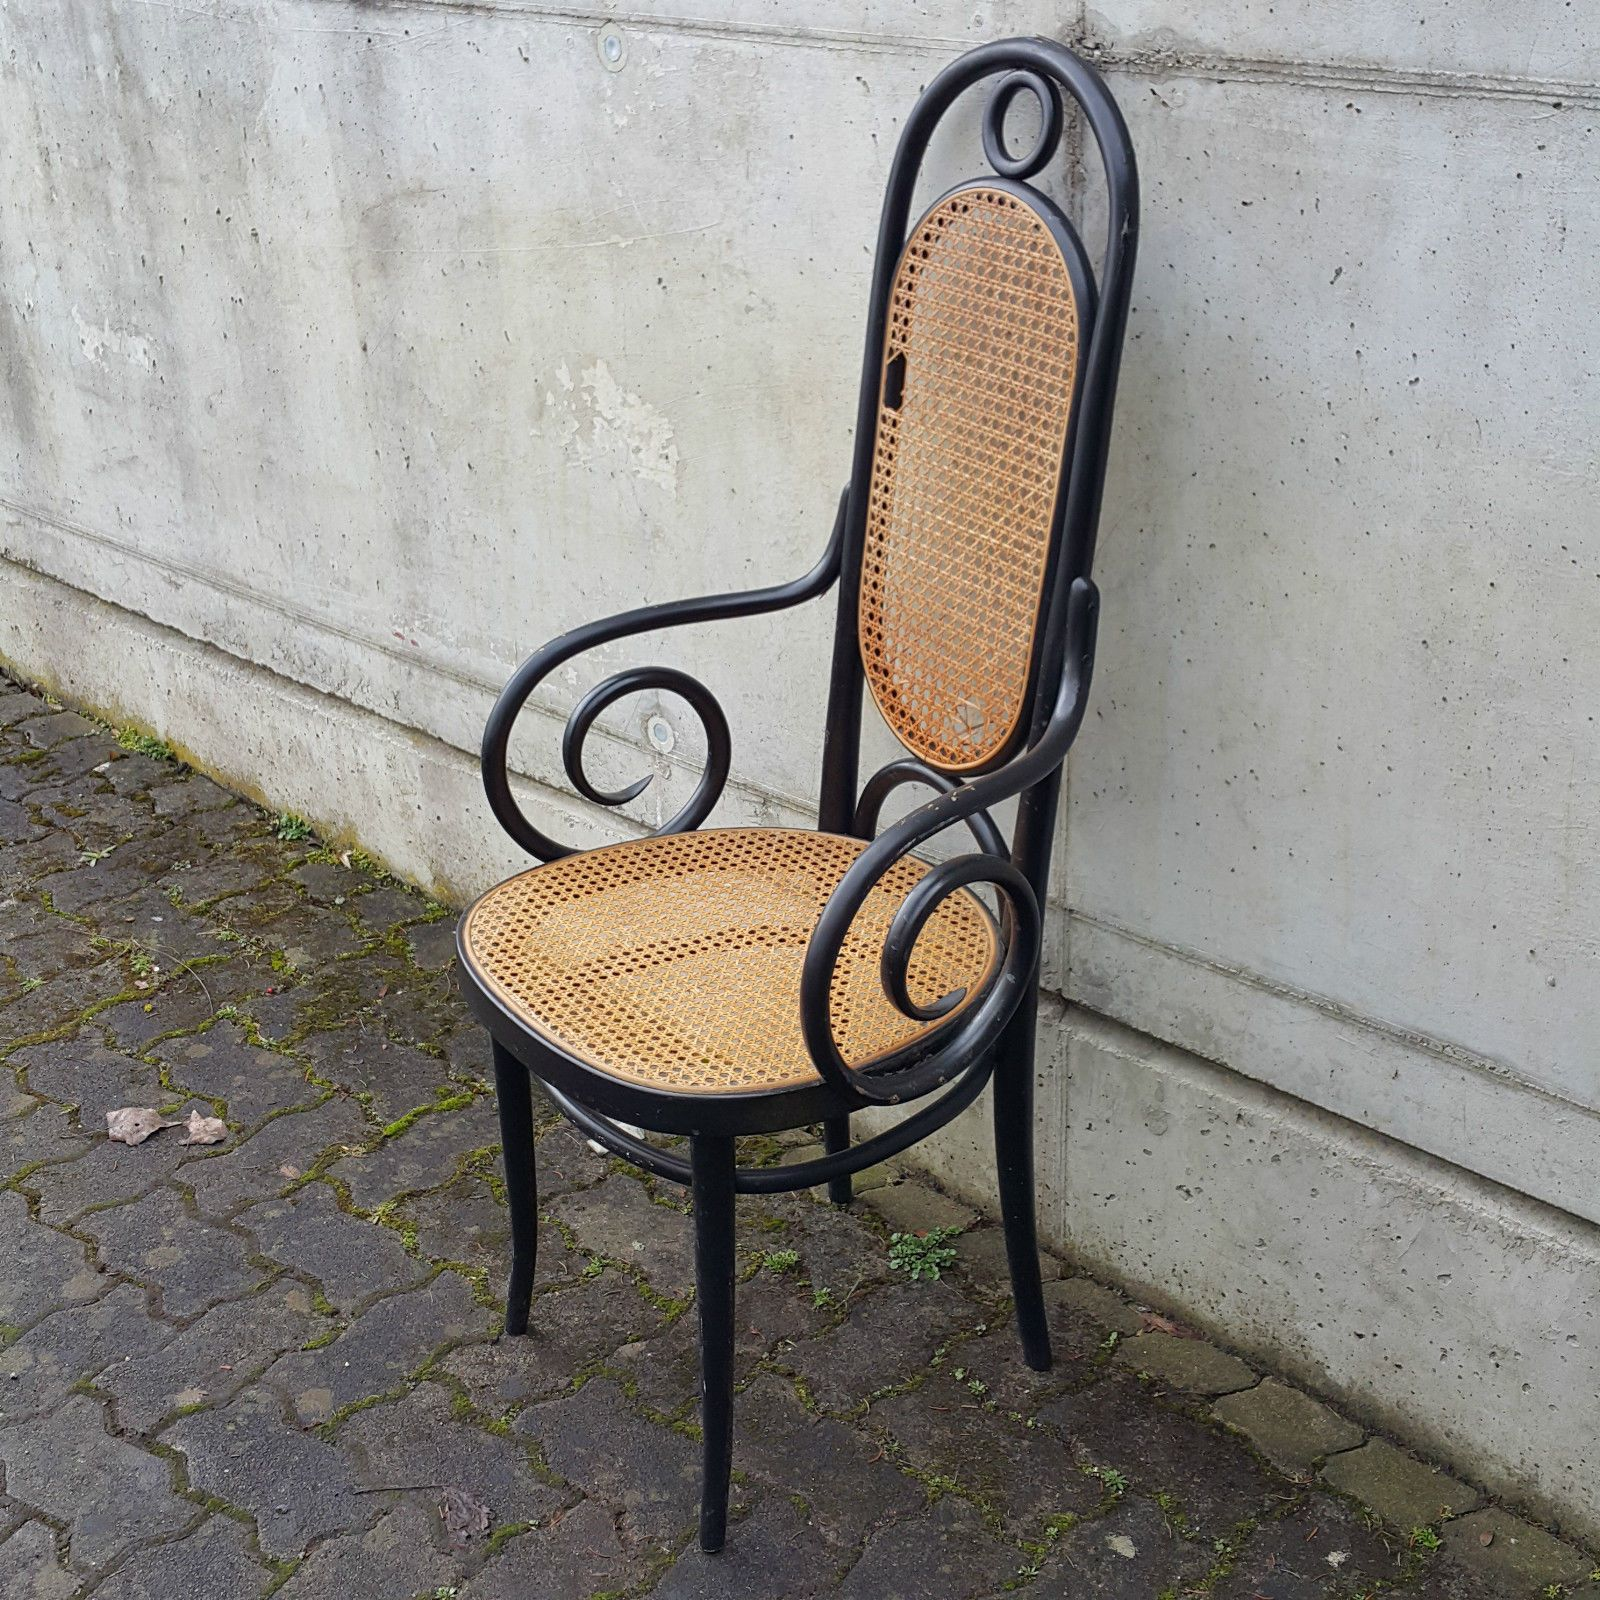 thonet fauteuil nr 17 antik armchair hochlehner stuhl wiener geflecht rarit t ebay thonet. Black Bedroom Furniture Sets. Home Design Ideas